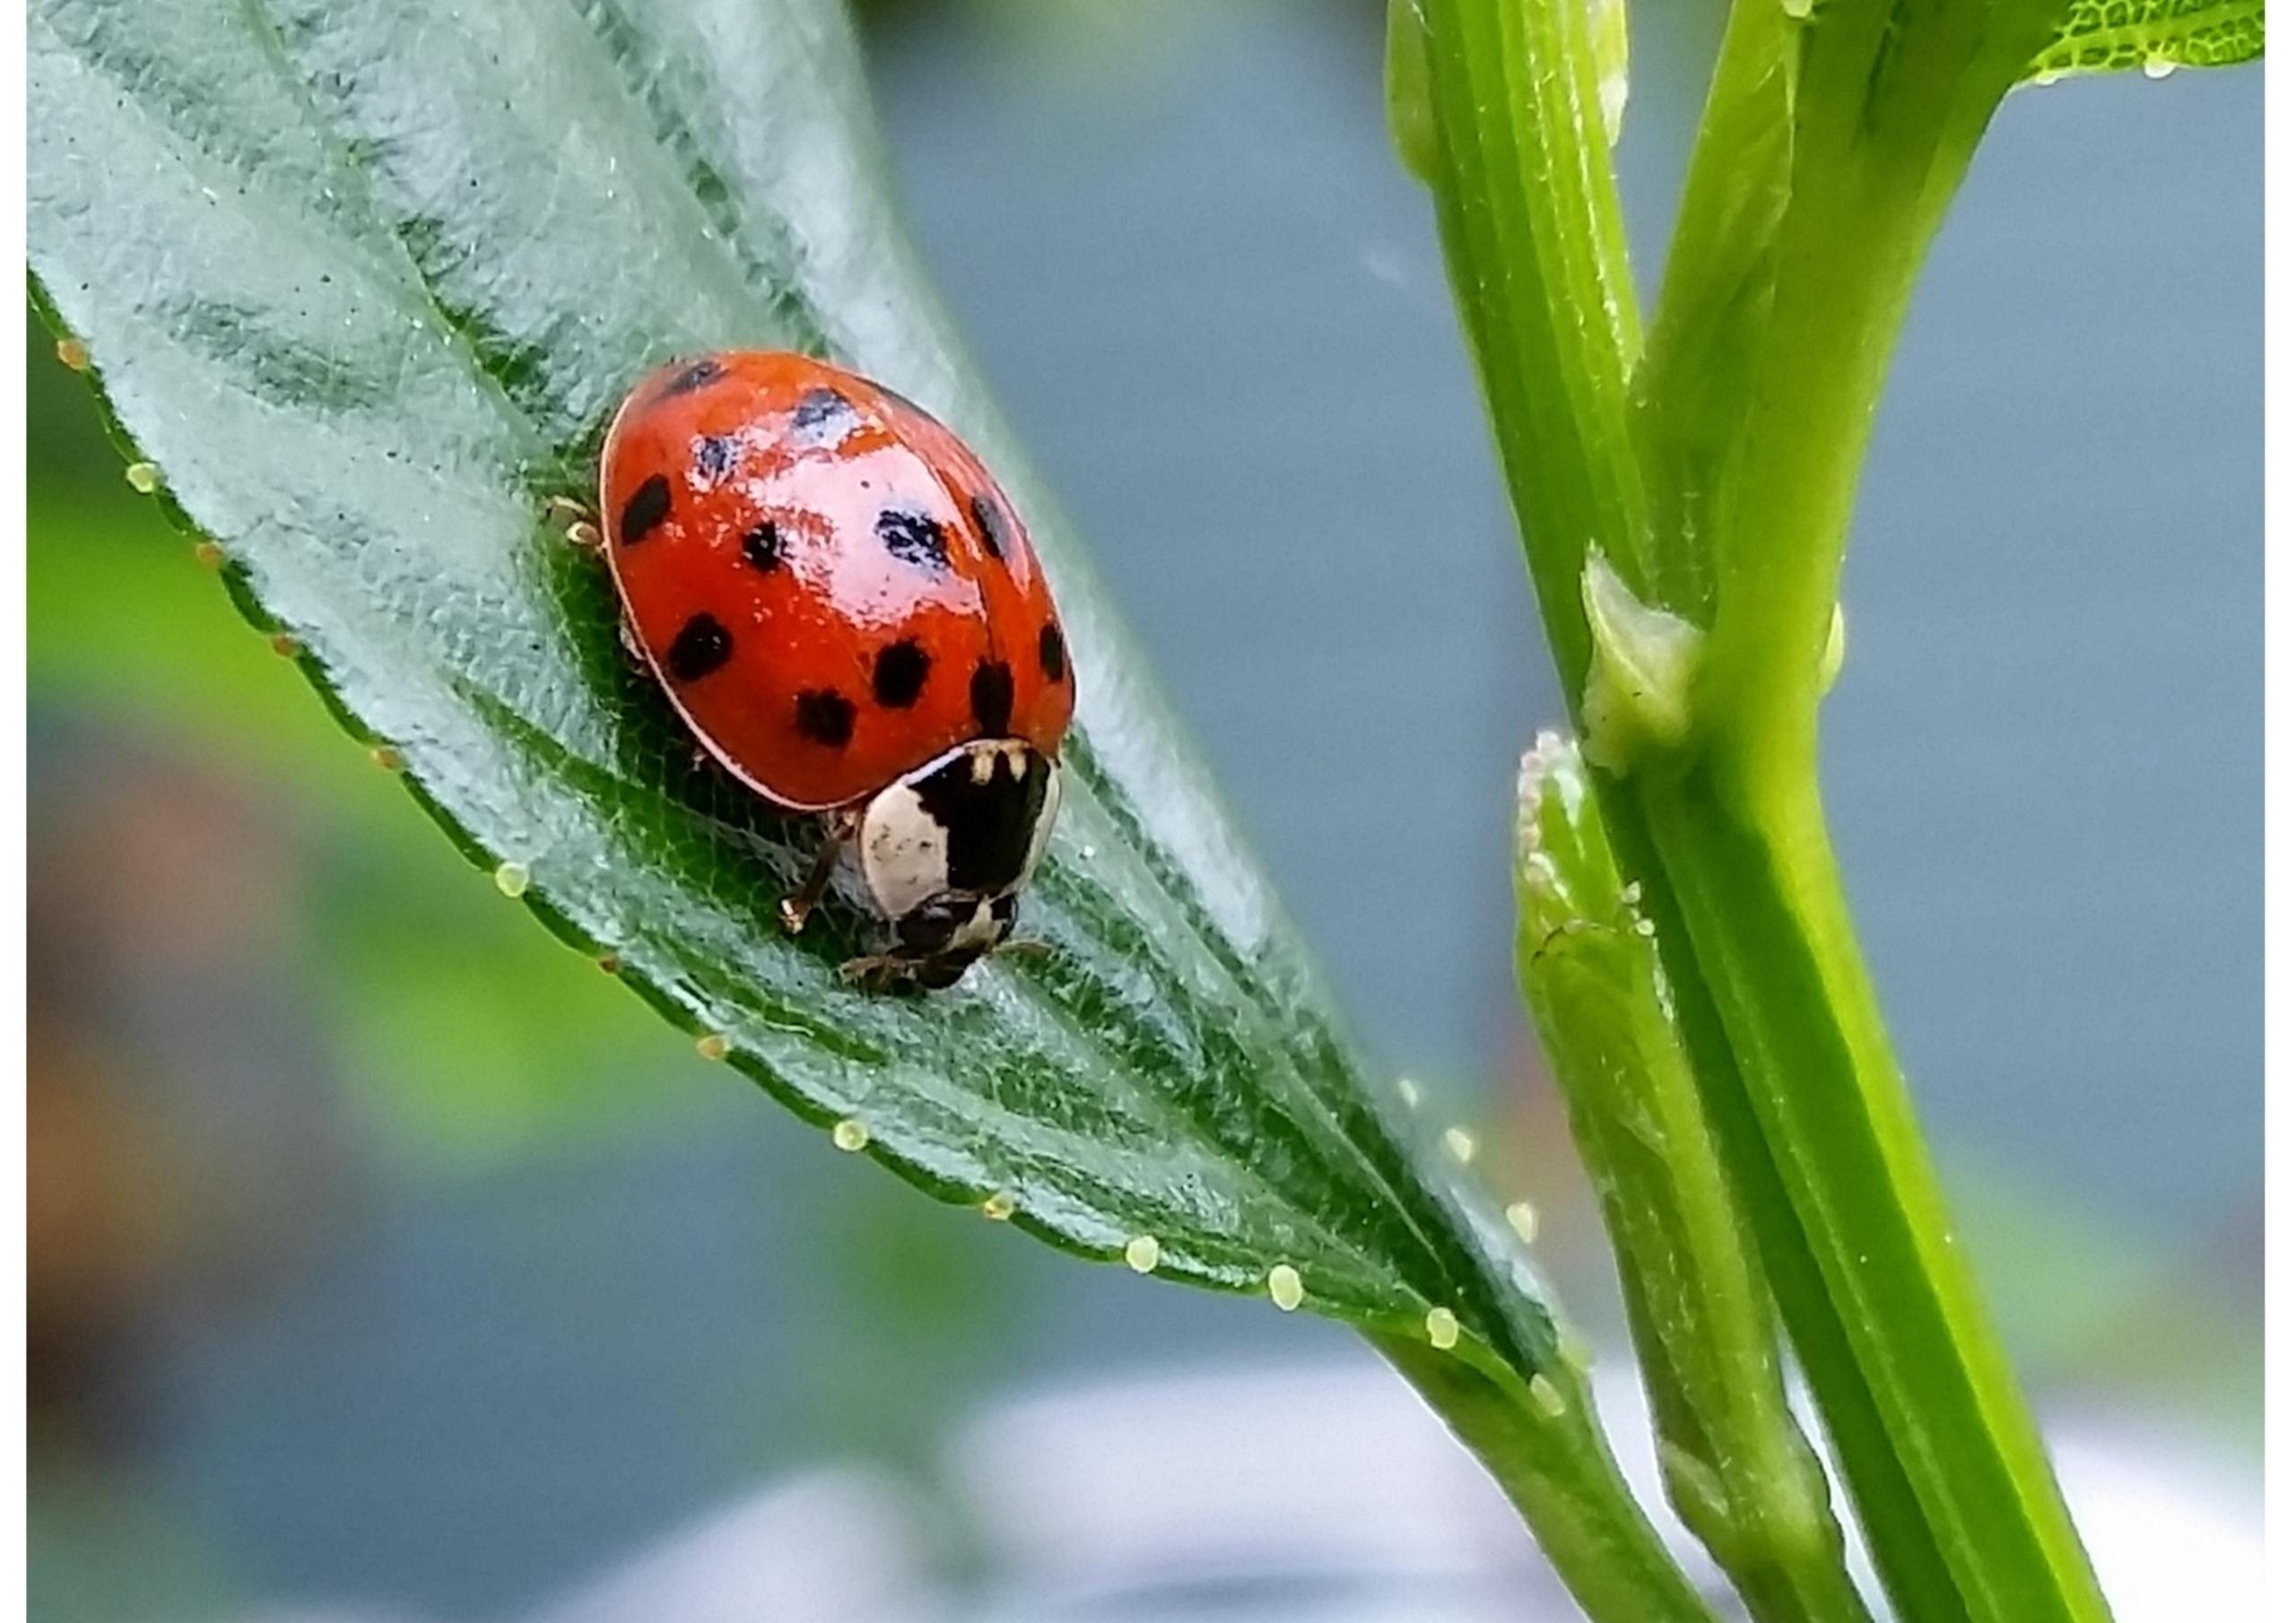 grasshoppers eat ladybugs - tehranchik   ello